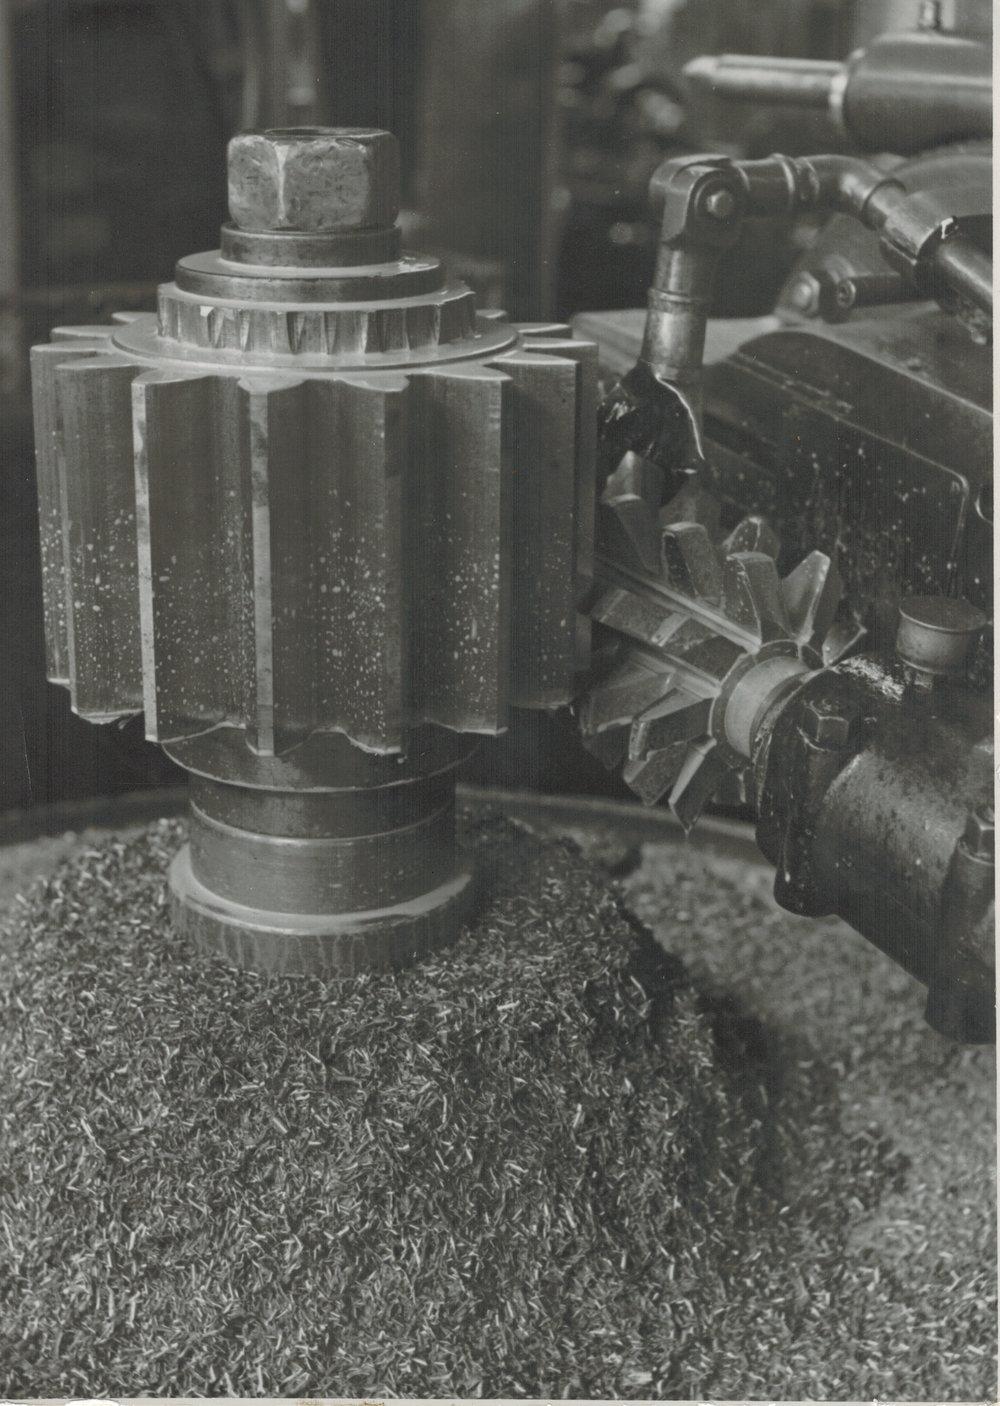 Albert Renger-Patzsch,  Study of a Machine Gear , c.1925-28, Gelatin silver print, 17.7 x 12.7 cm, Stamped verso